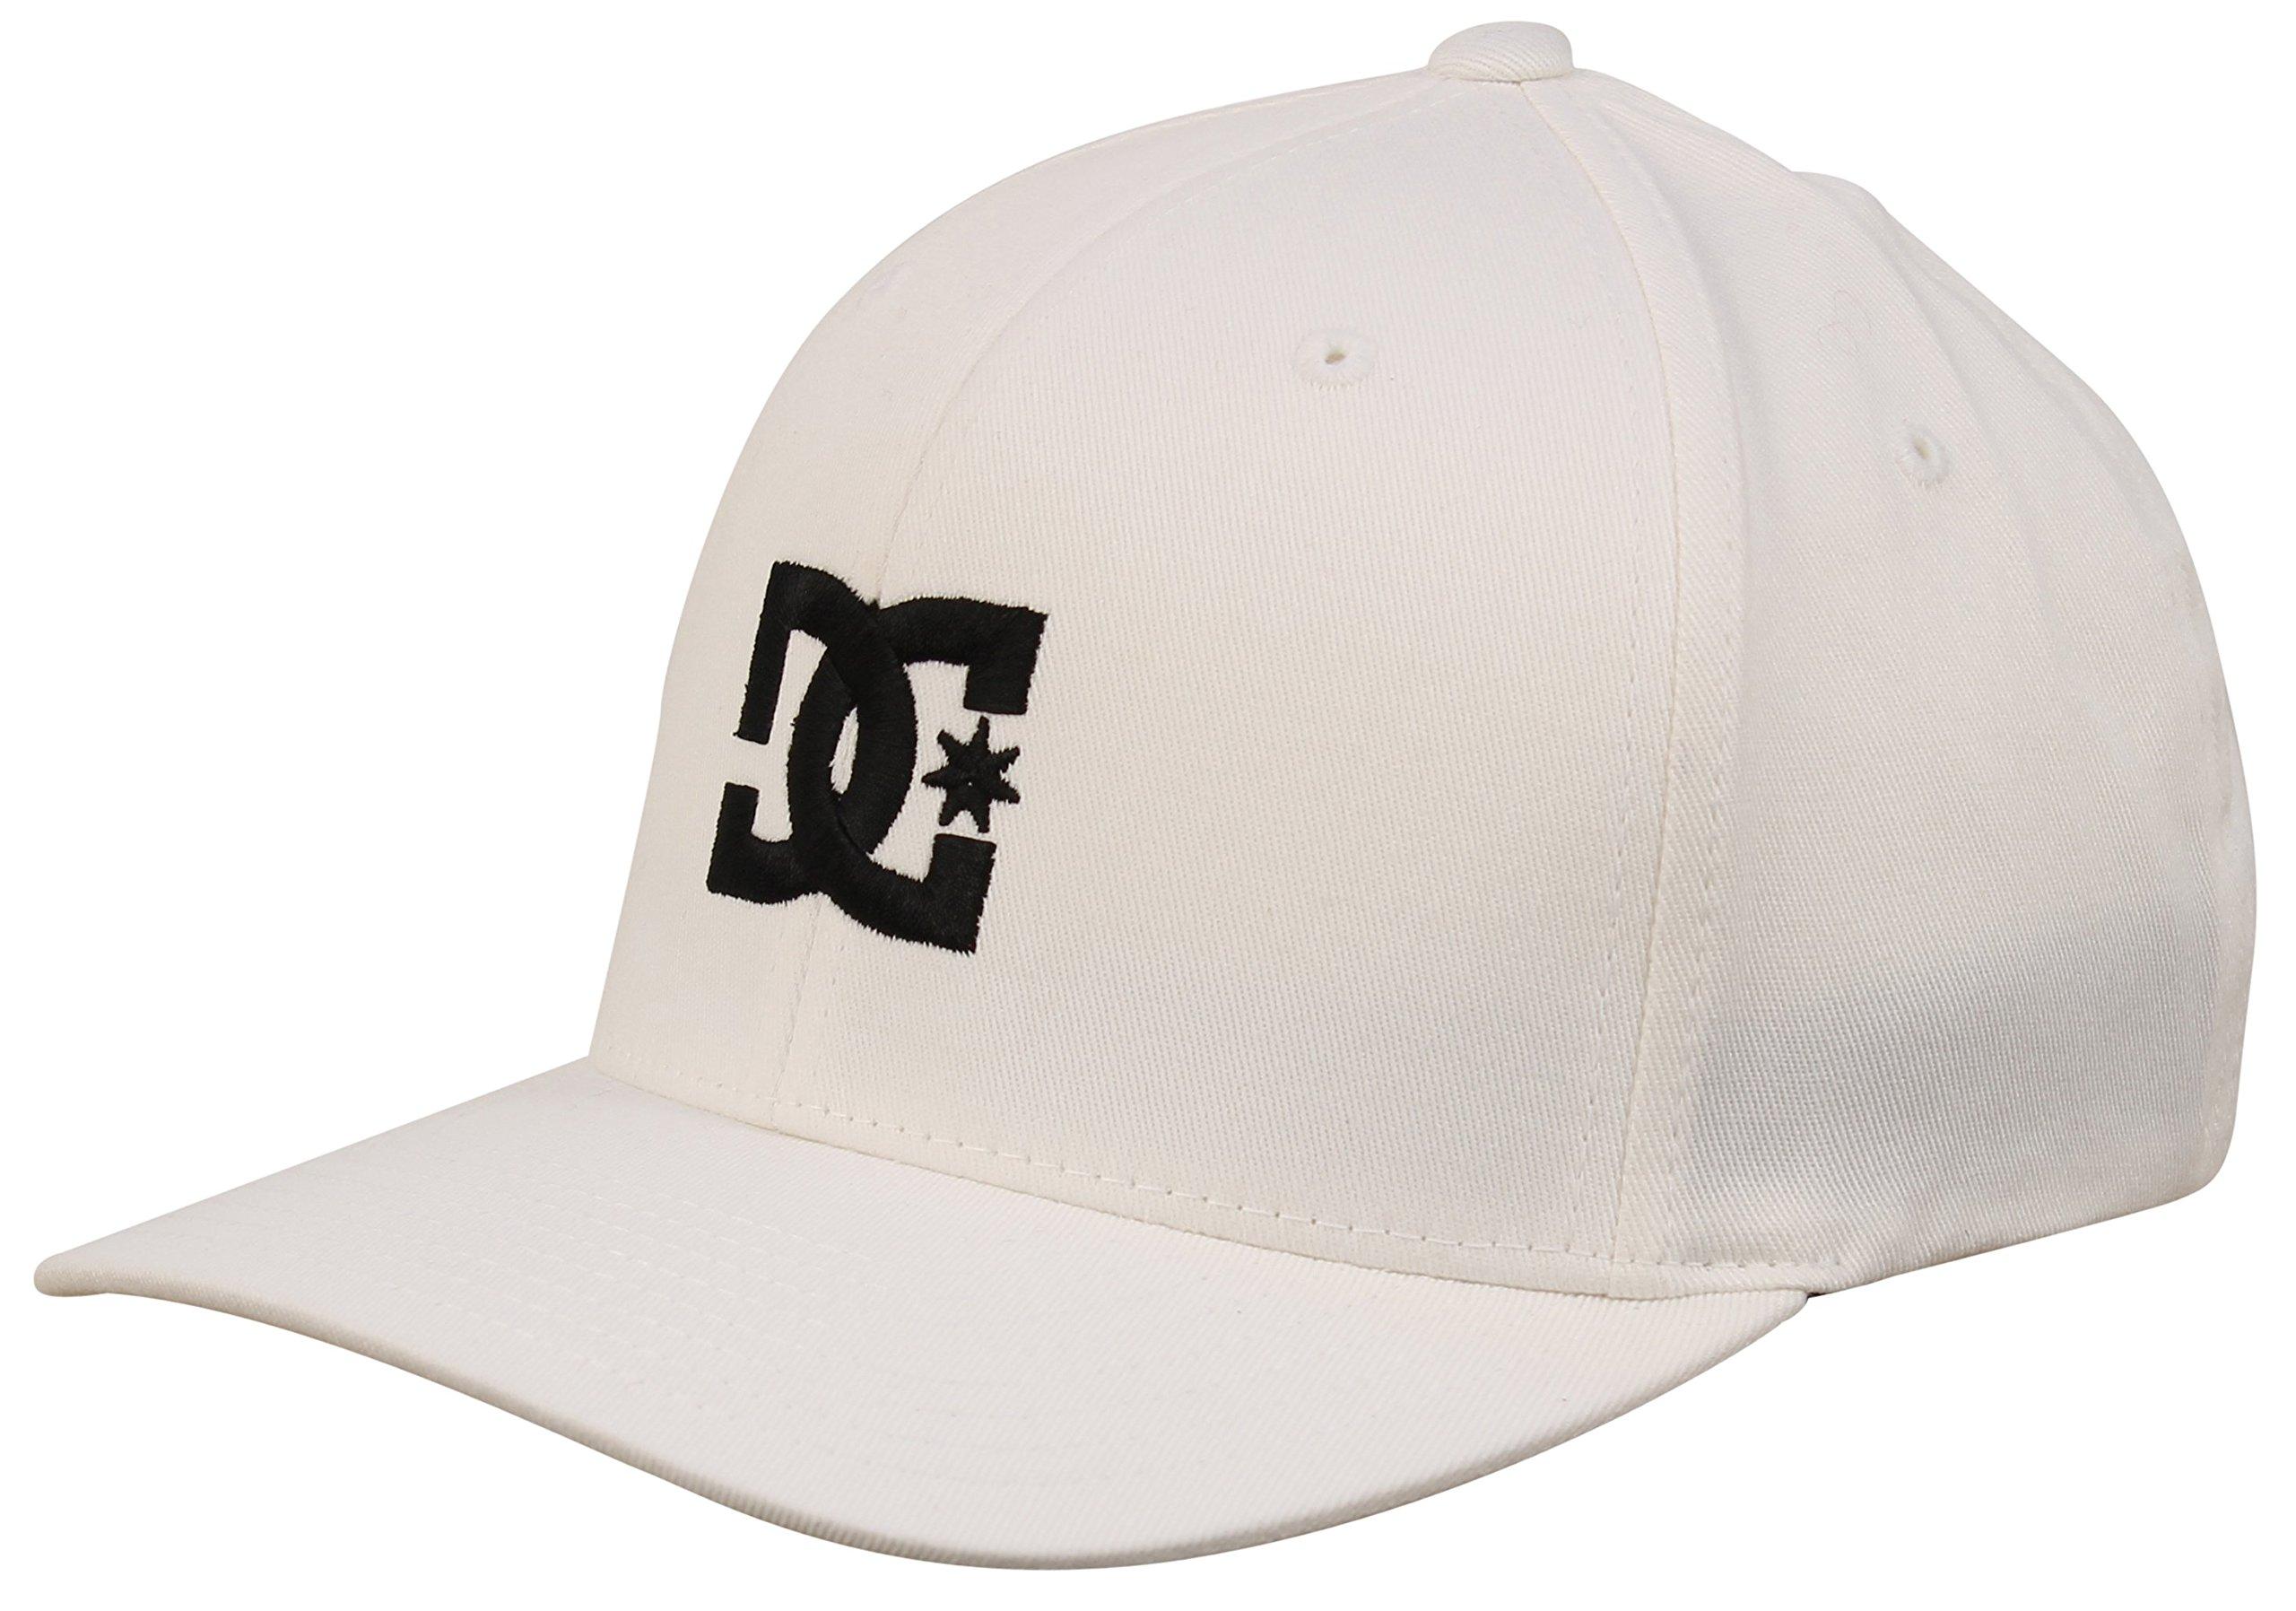 DC Men's Cap Star 2 Hat, White/Black, L/XL